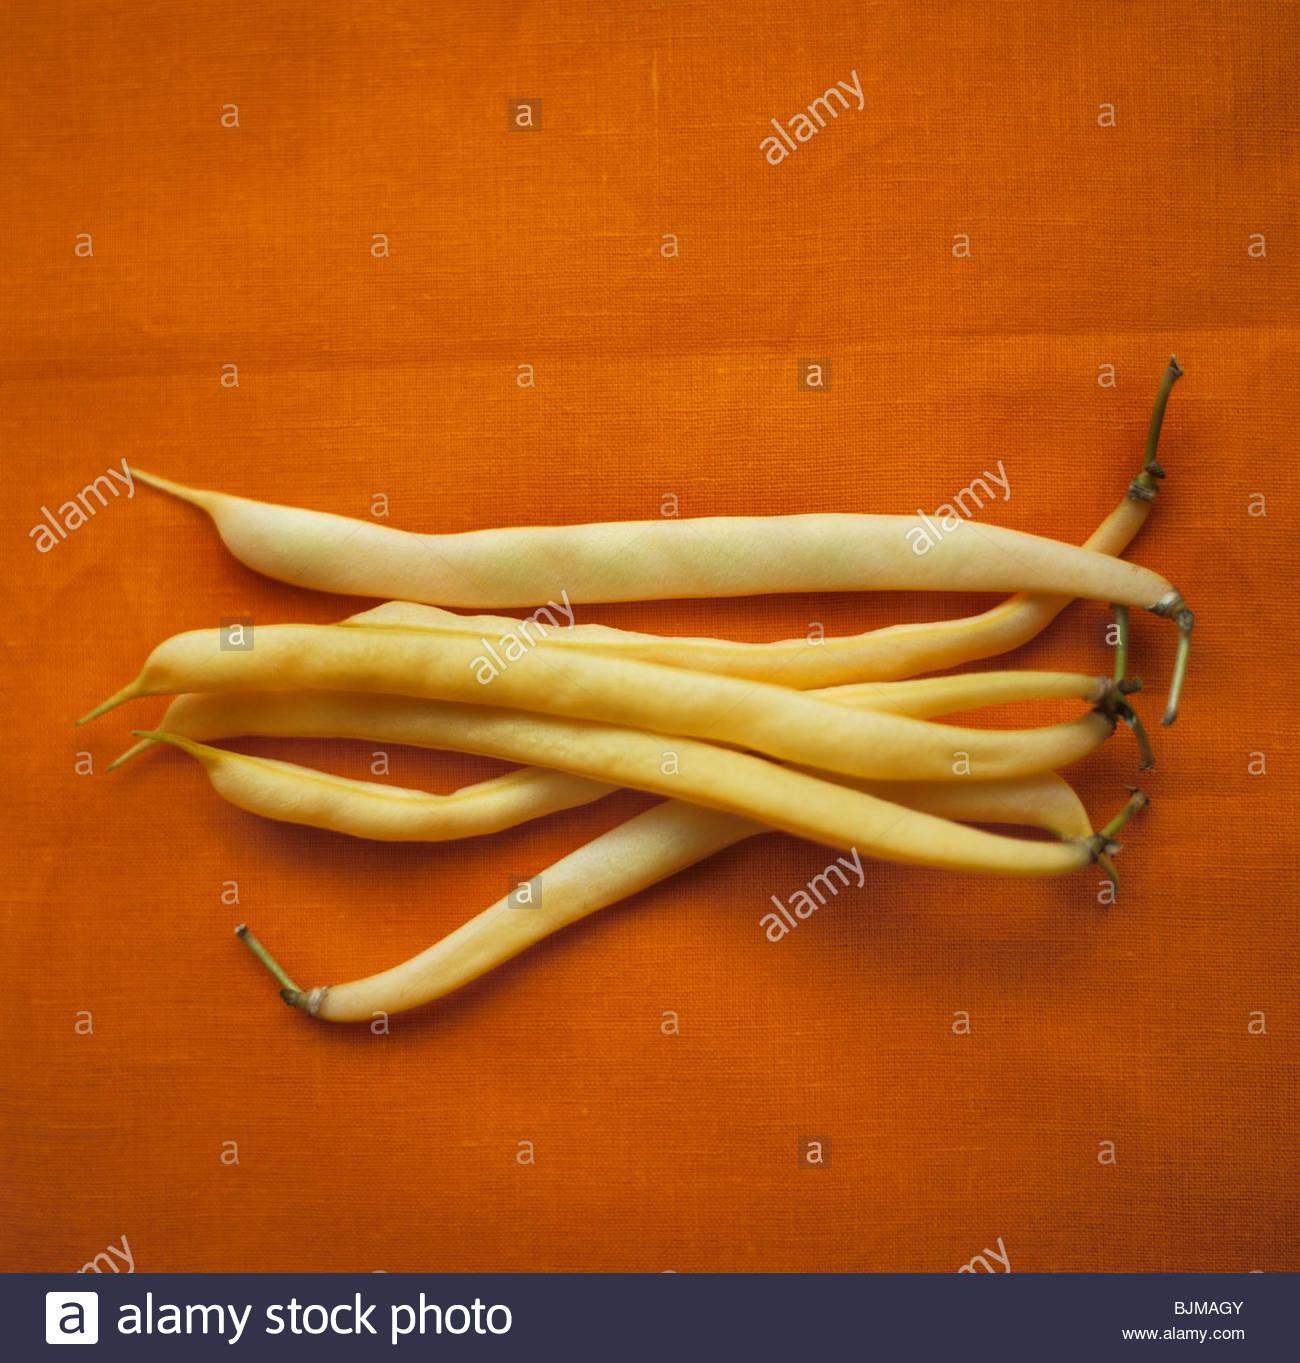 Frijoles cera contra el fondo naranja Imagen De Stock